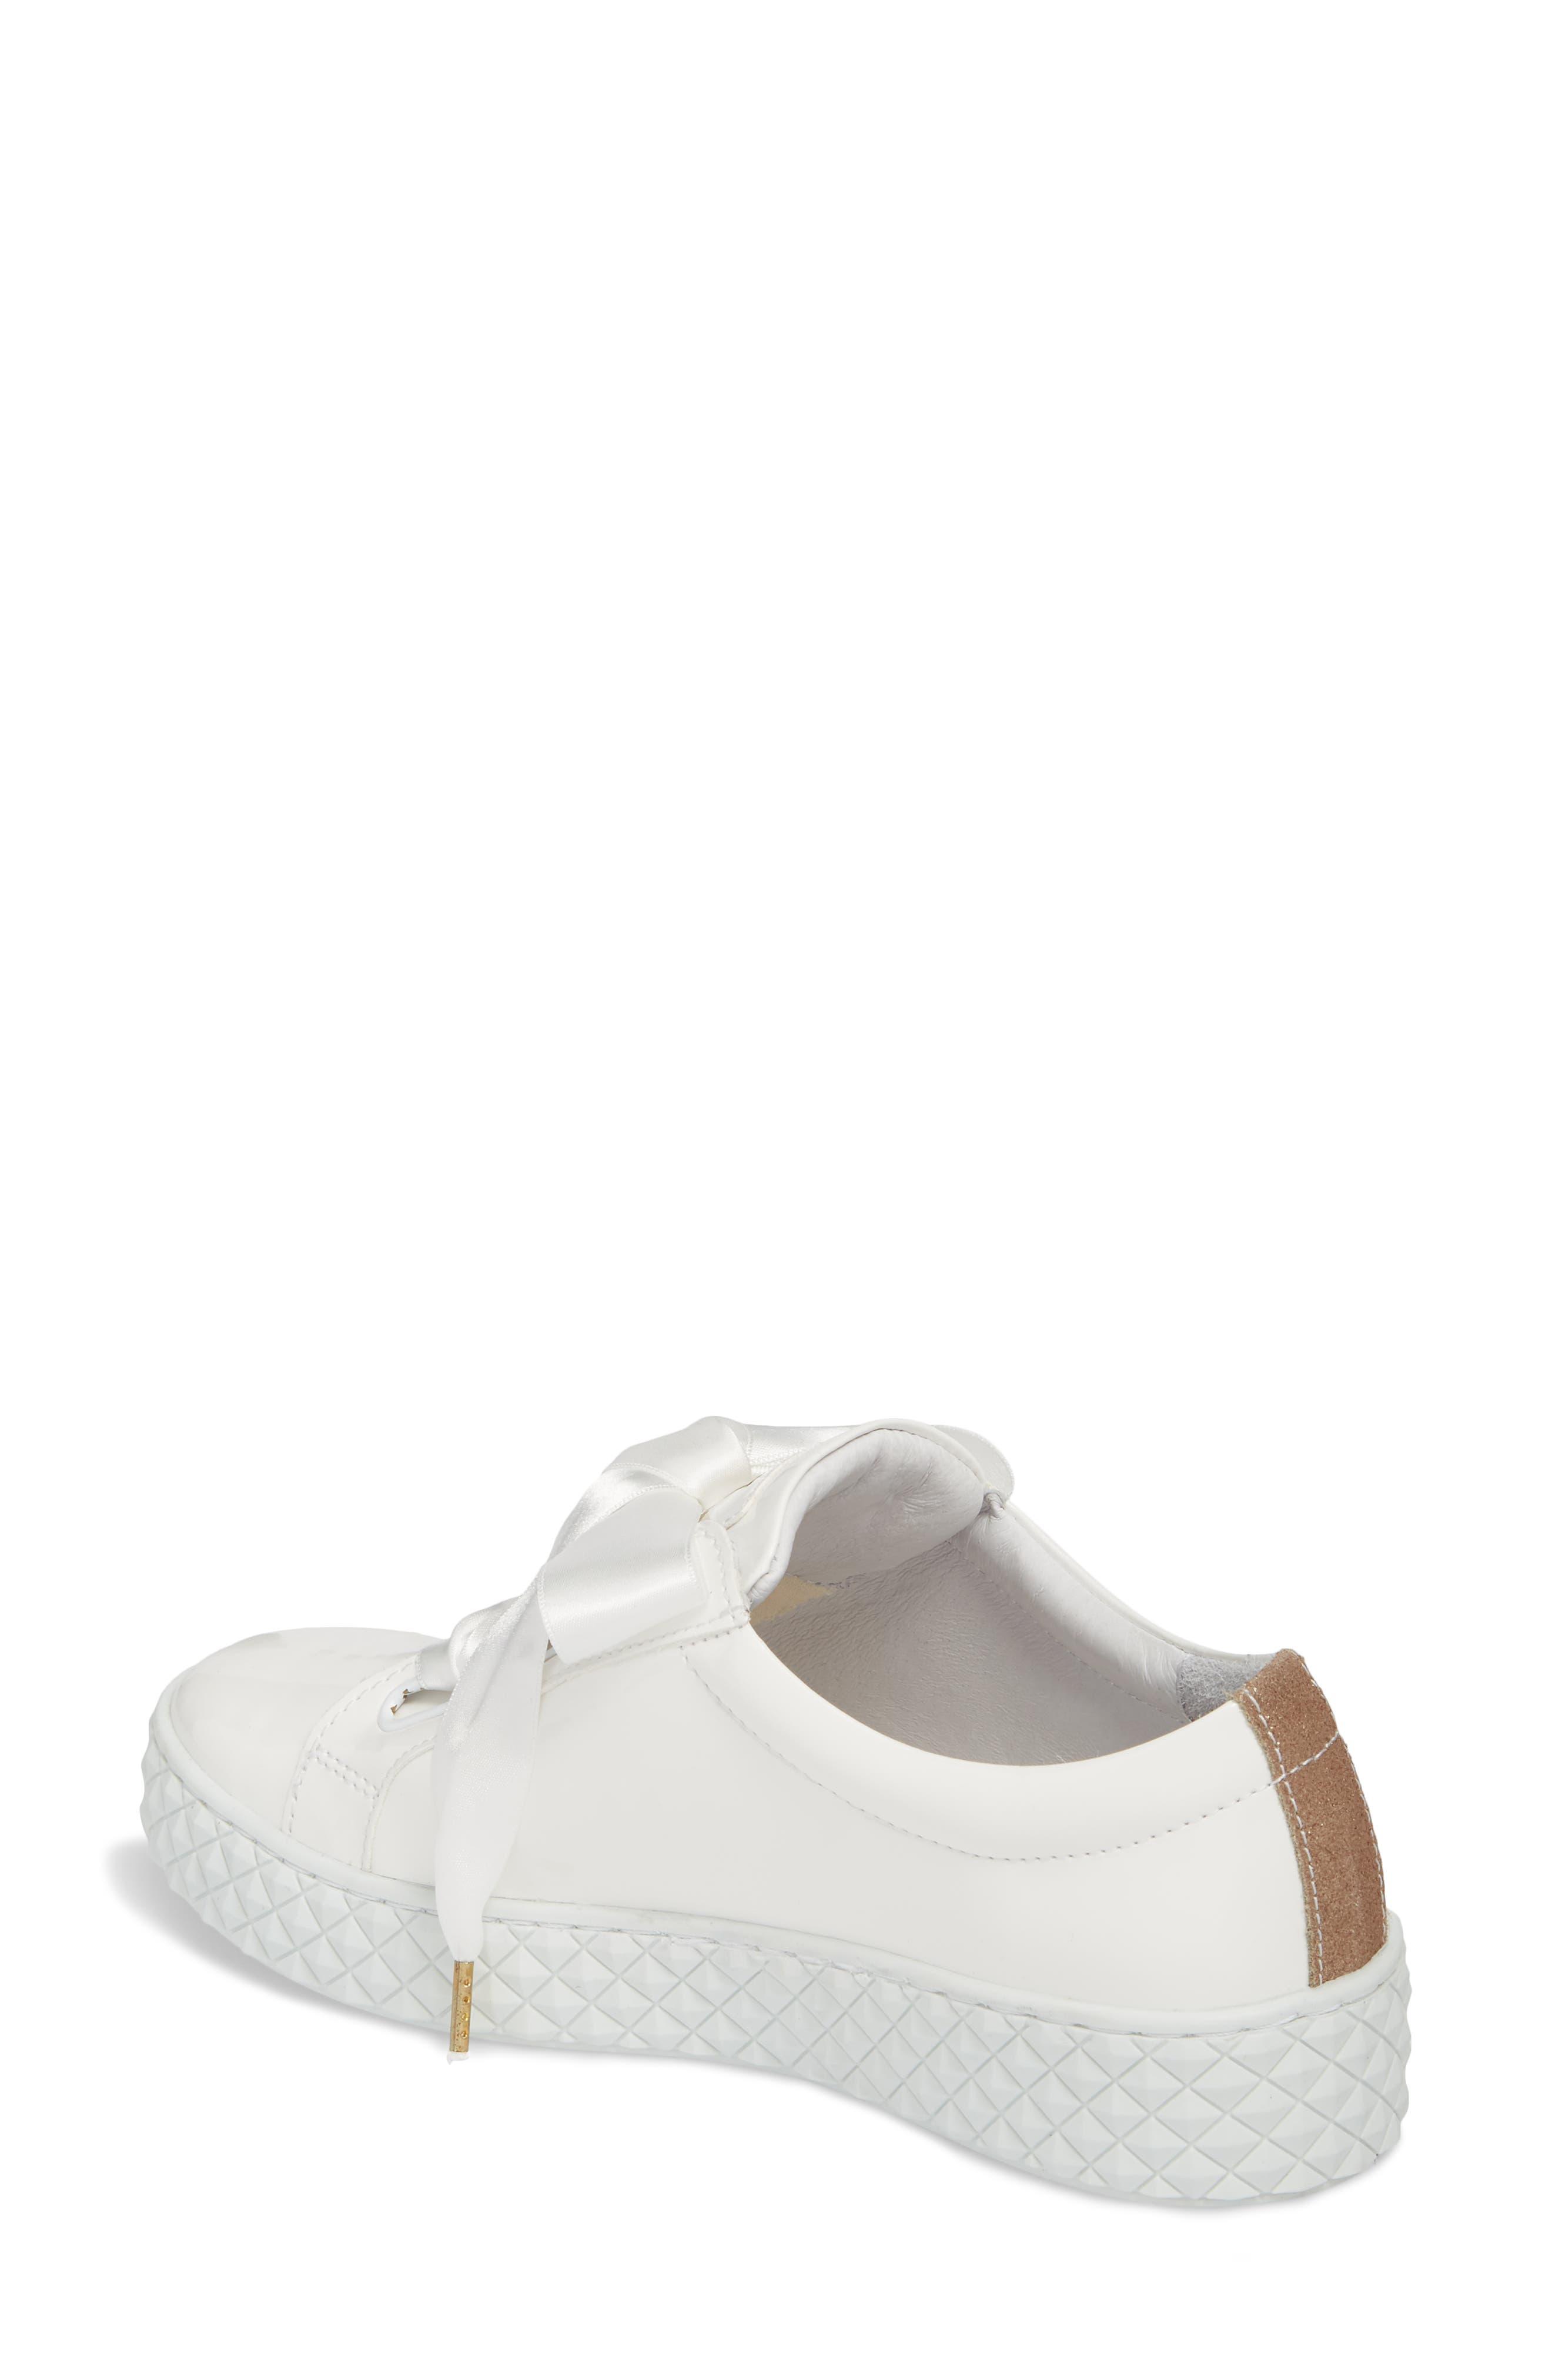 Acton Sneaker,                             Alternate thumbnail 2, color,                             White Patent